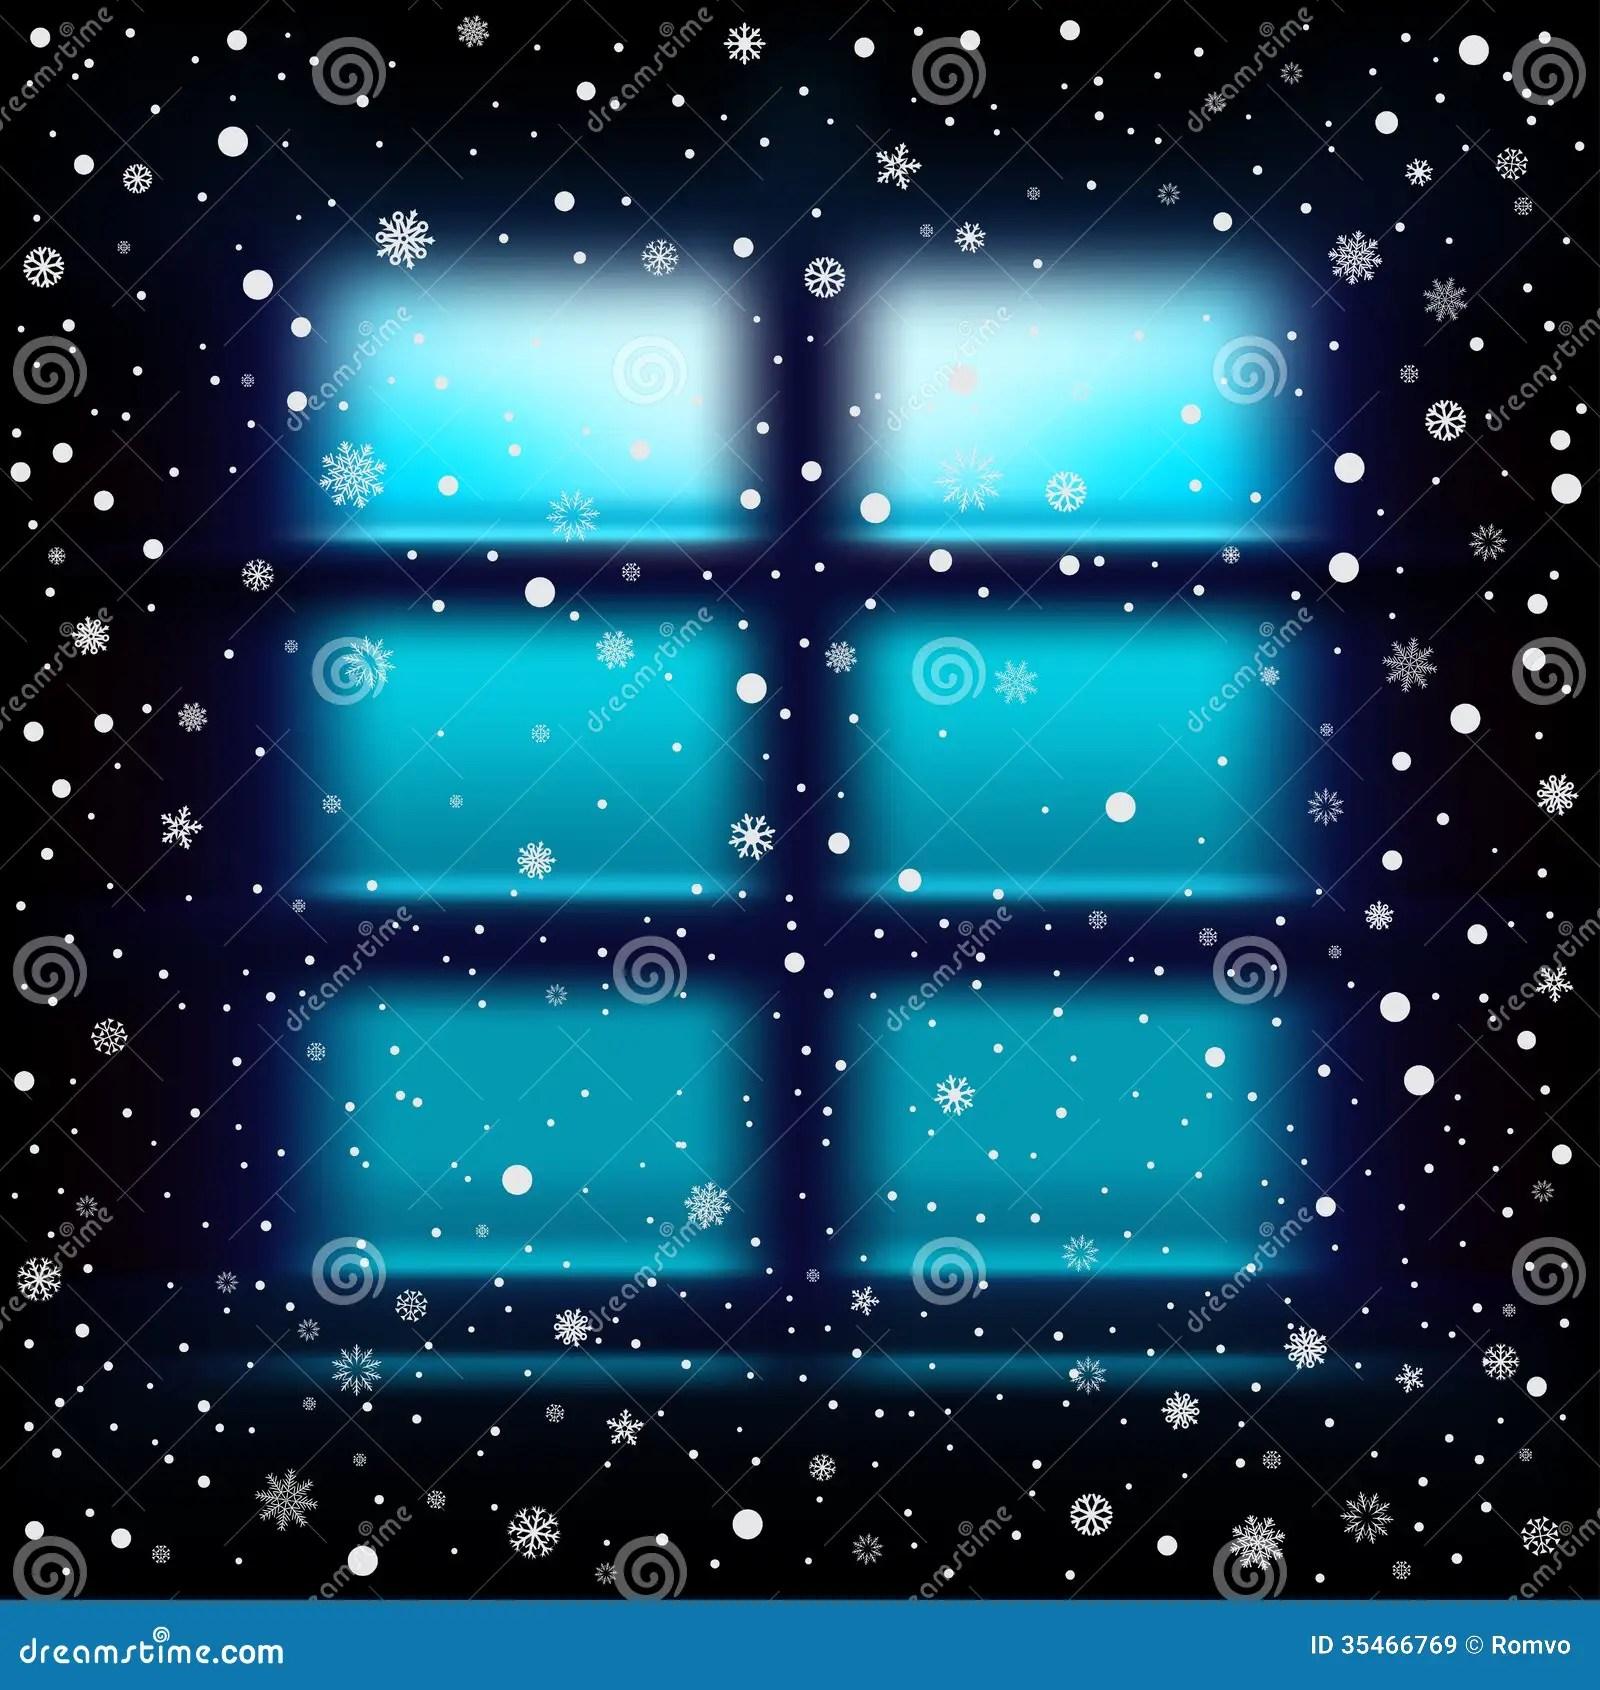 Snow Night Large Window Royalty Free Stock Images Image